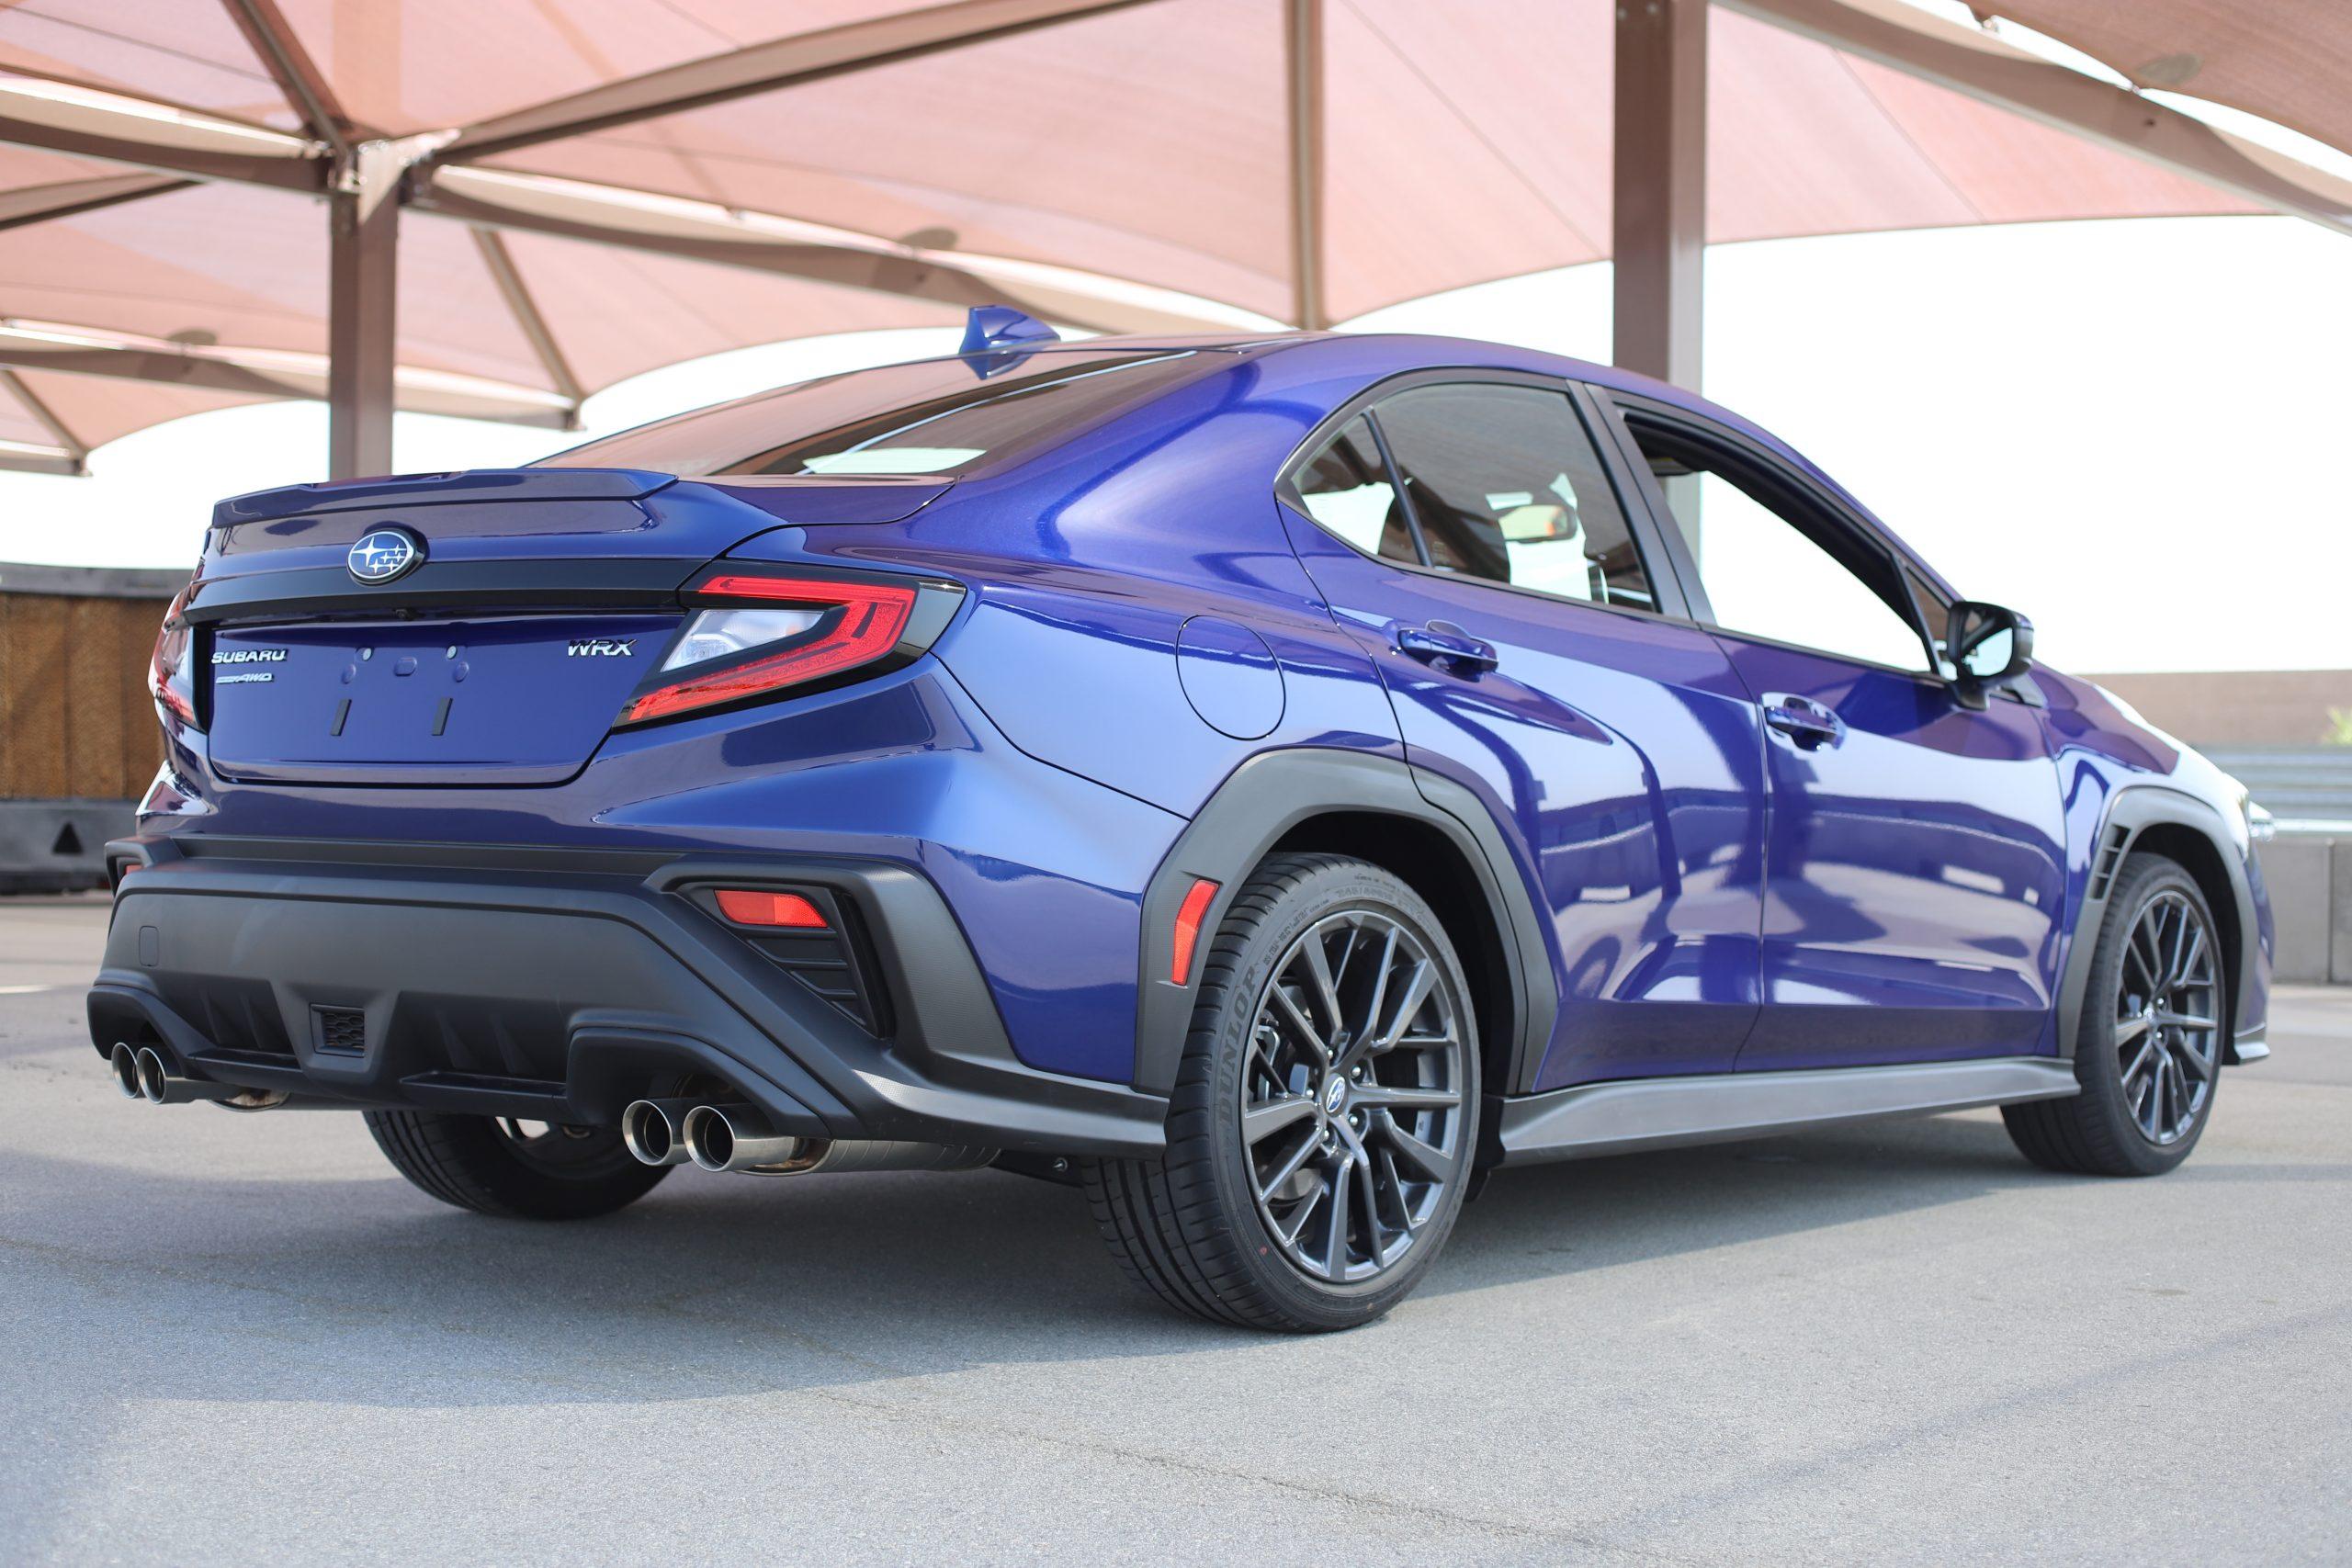 2022 Subaru WRX blue rear three-quarter